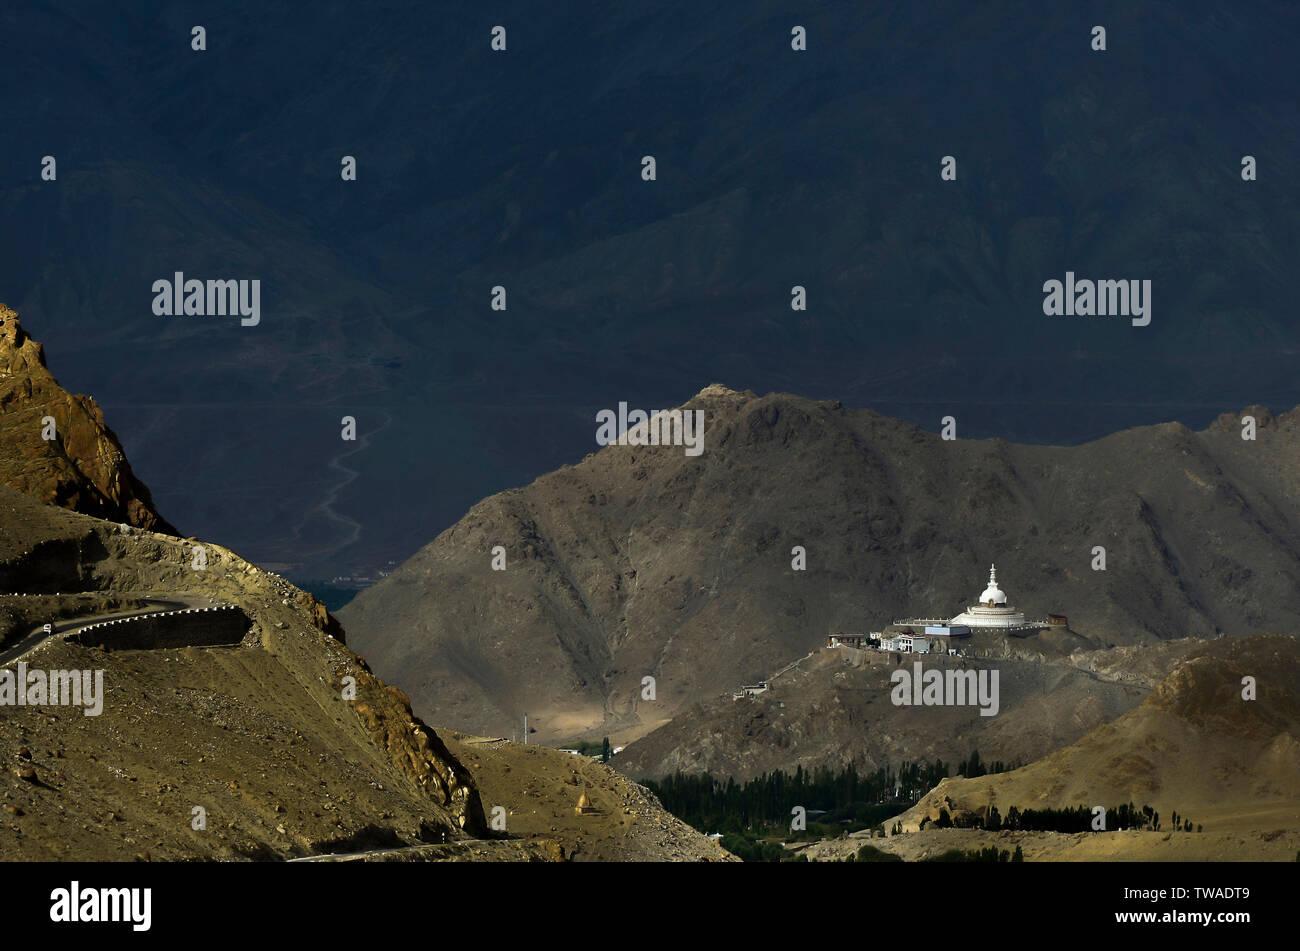 Shanti Stupa long shot, Buddhist white-domed stupa or chorten on a hilltop in Chanspa, Leh district, Ladakh, India. Stock Photo